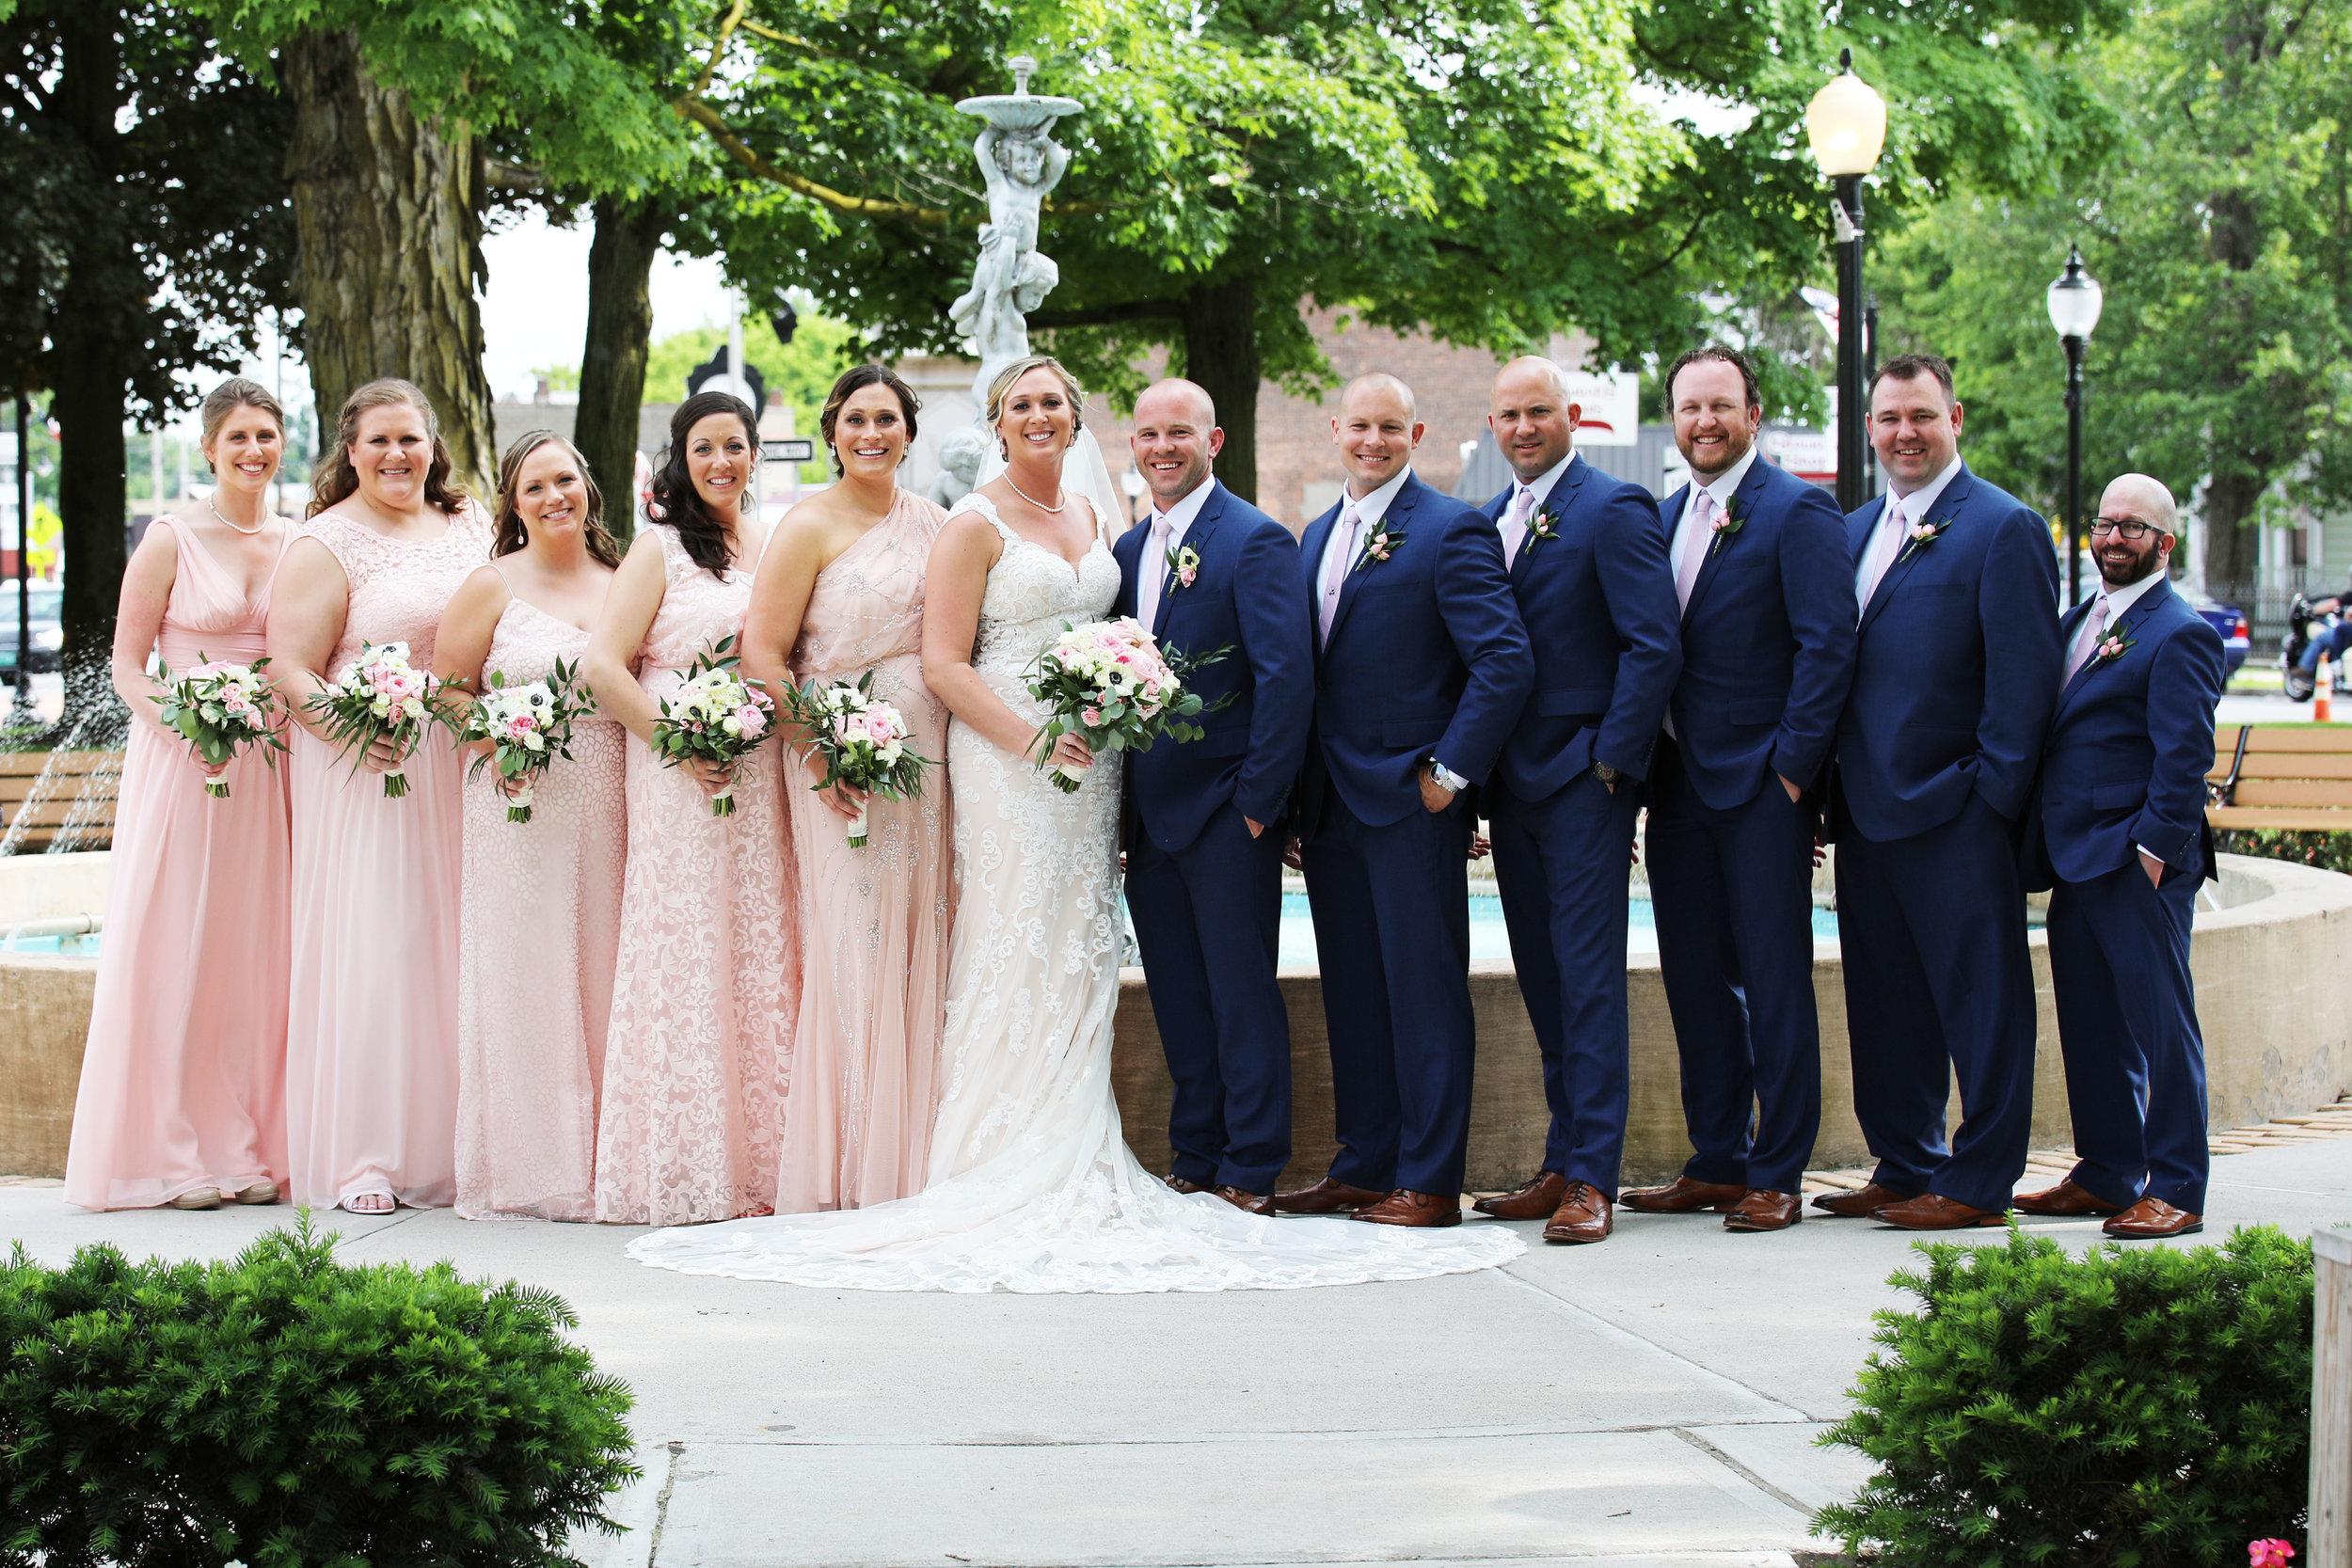 Glens Falls NY Wedding